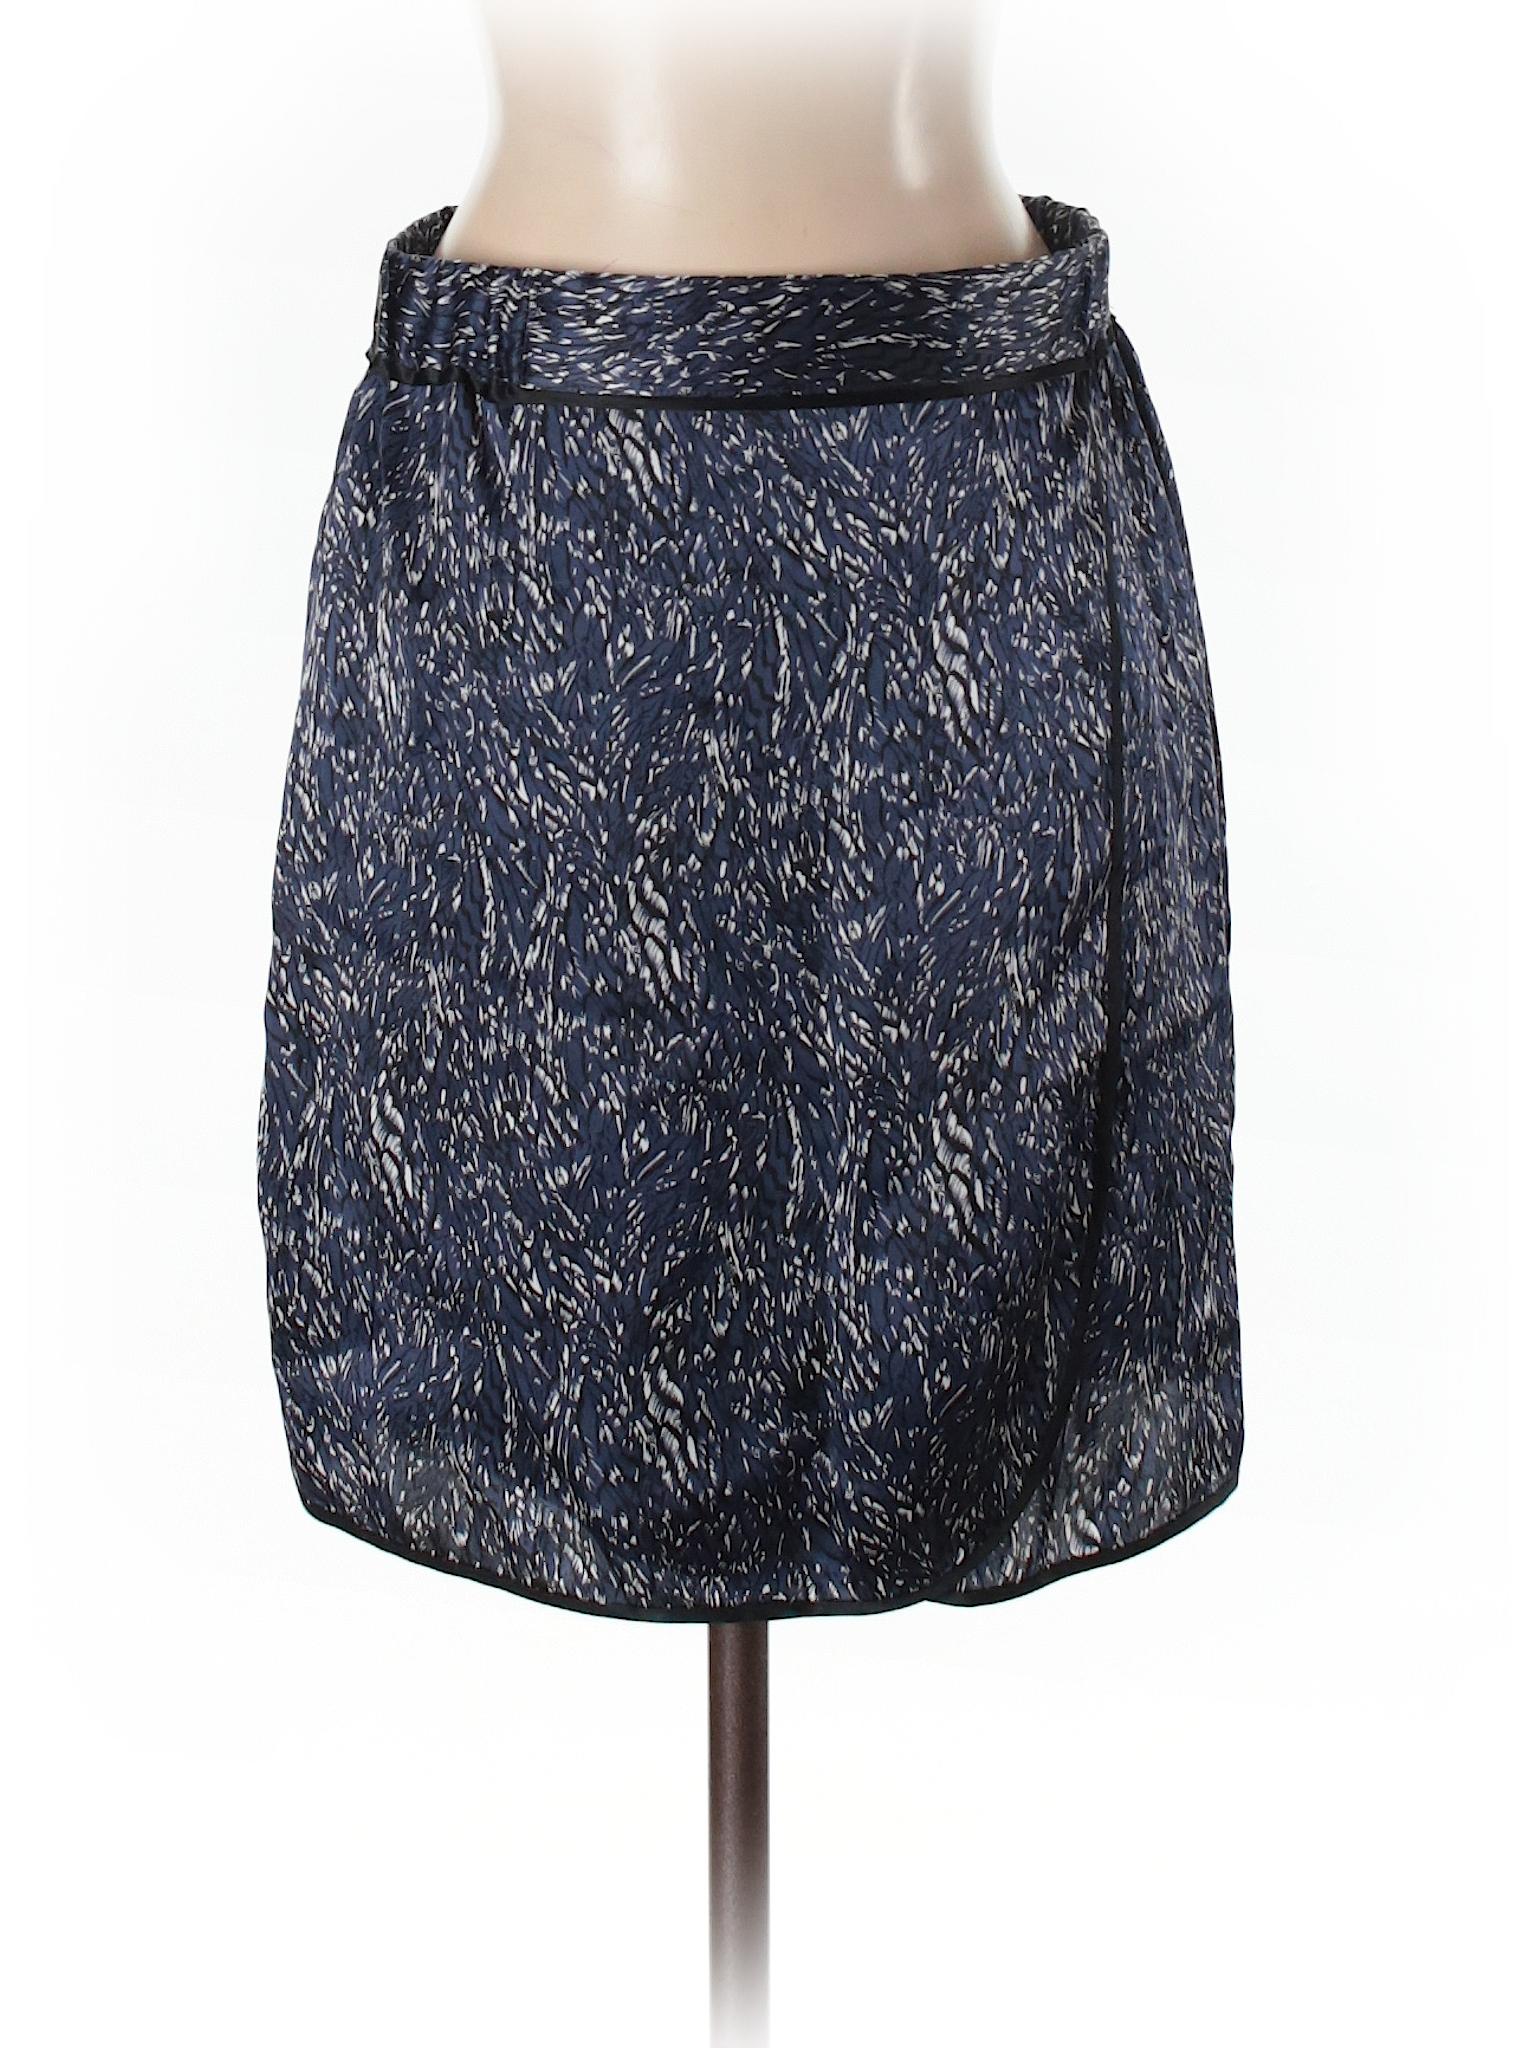 Boutique Silk Silk Boutique Skirt Skirt Silk Boutique Boutique Skirt Silk Skirt Boutique rrBUqpA